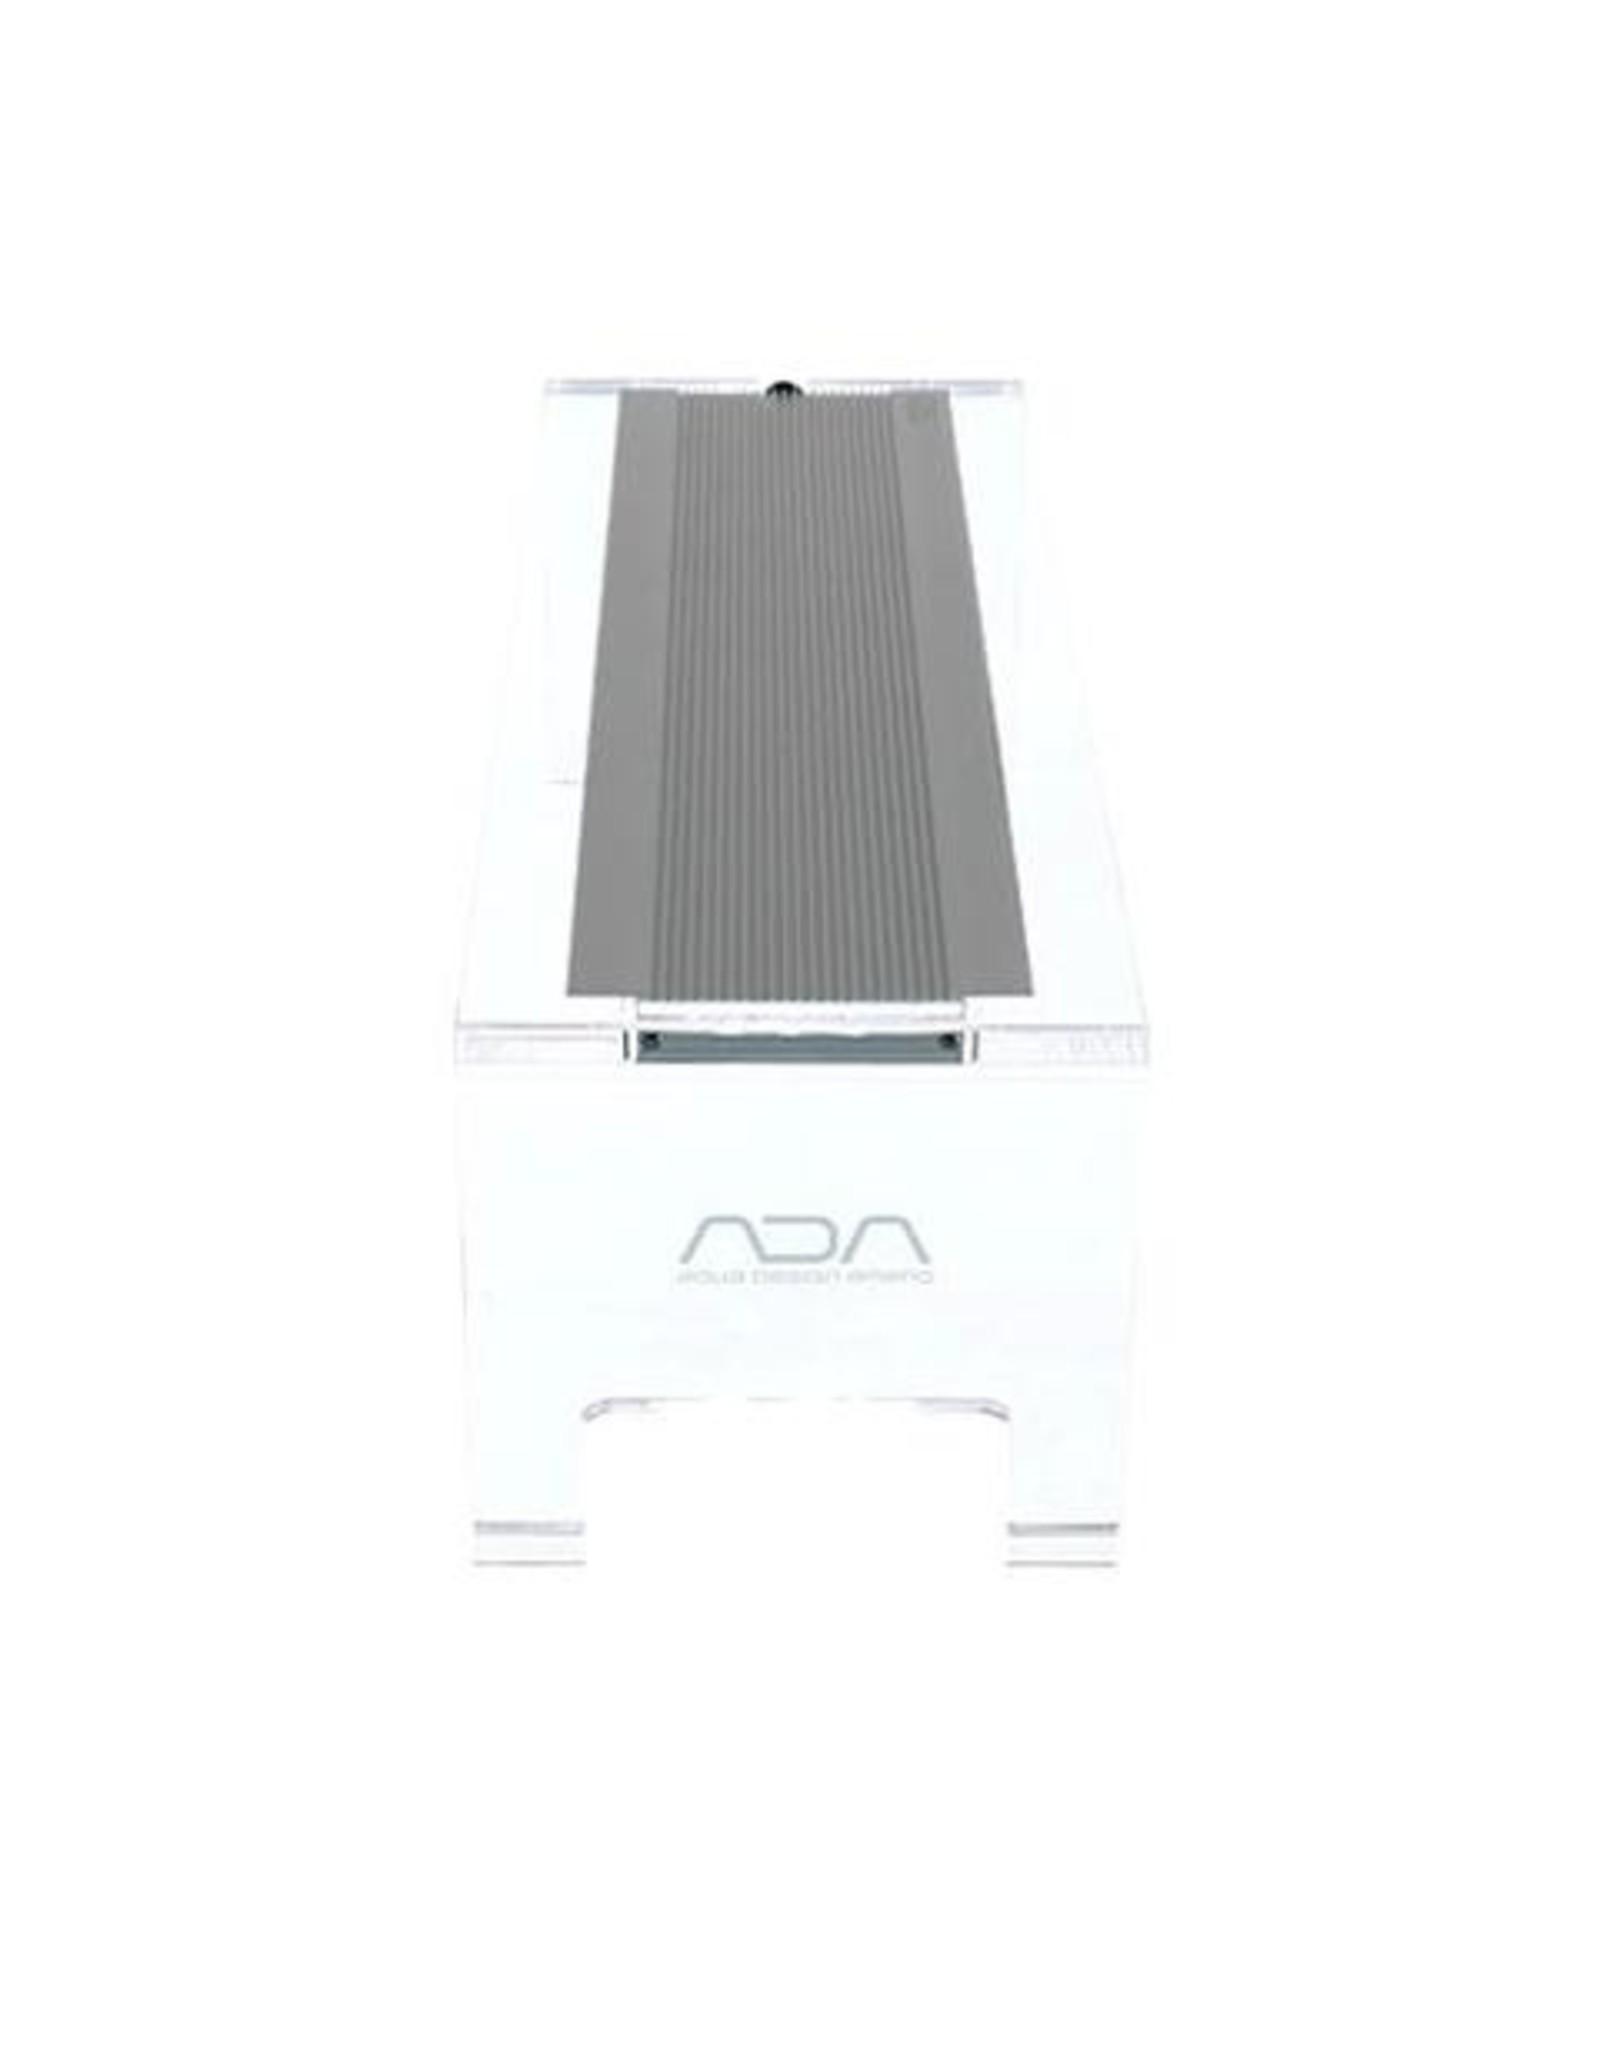 ADA ADA Aquasky G361